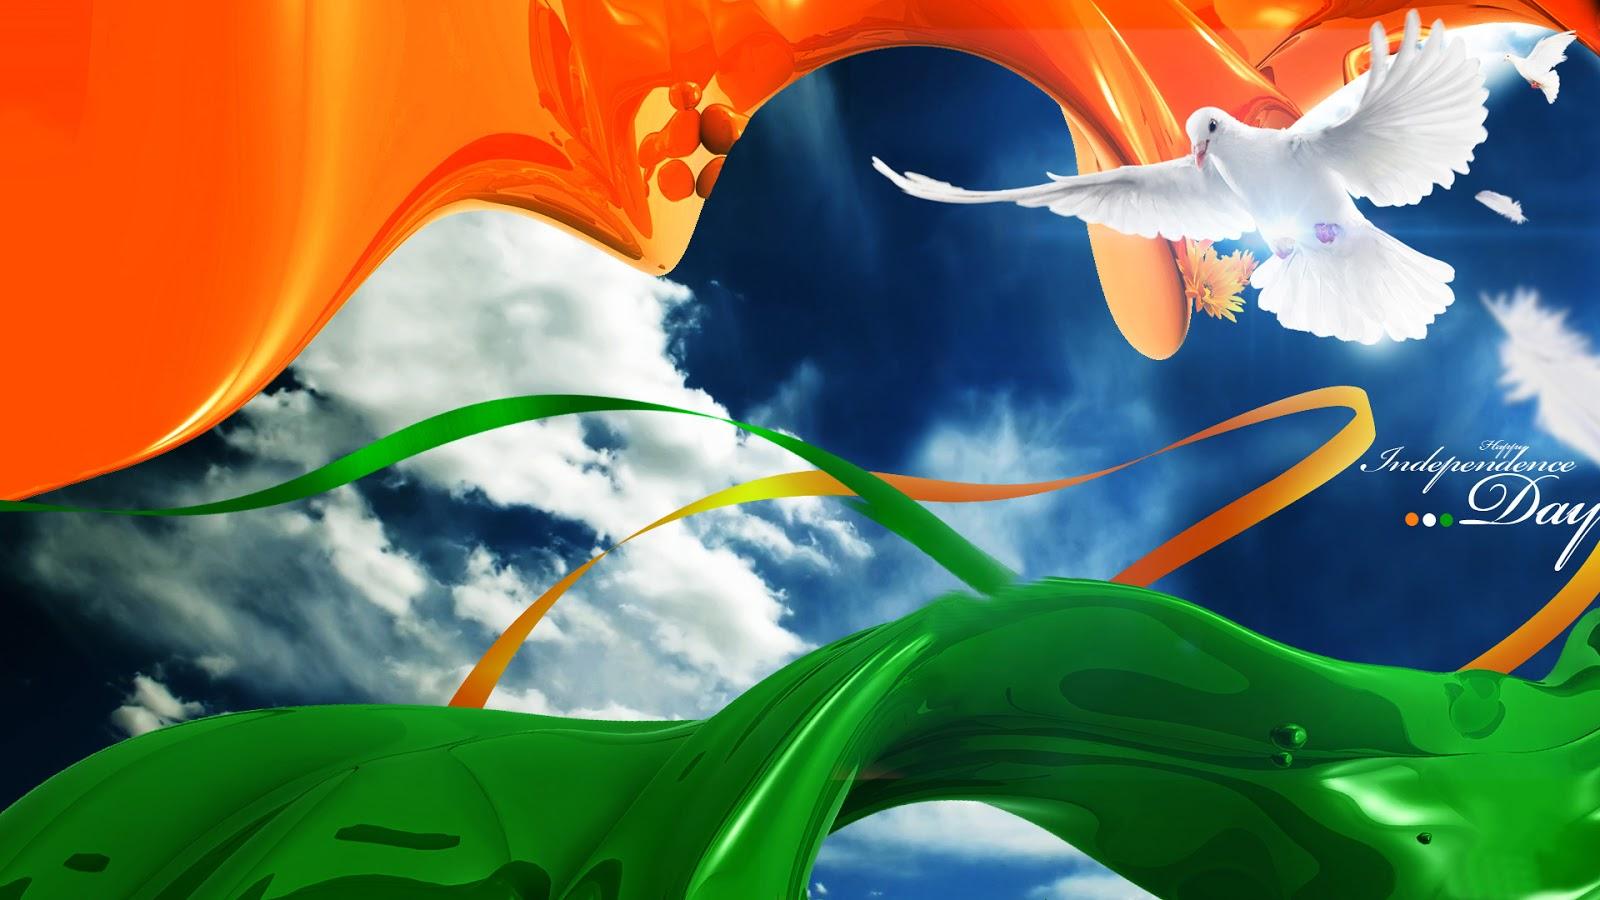 http://1.bp.blogspot.com/-u0vmwTYtwXE/UQZaD2Z3YpI/AAAAAAAAAVM/iBqTWEueNT8/s1600/India-flag-Wallpapers.jpg